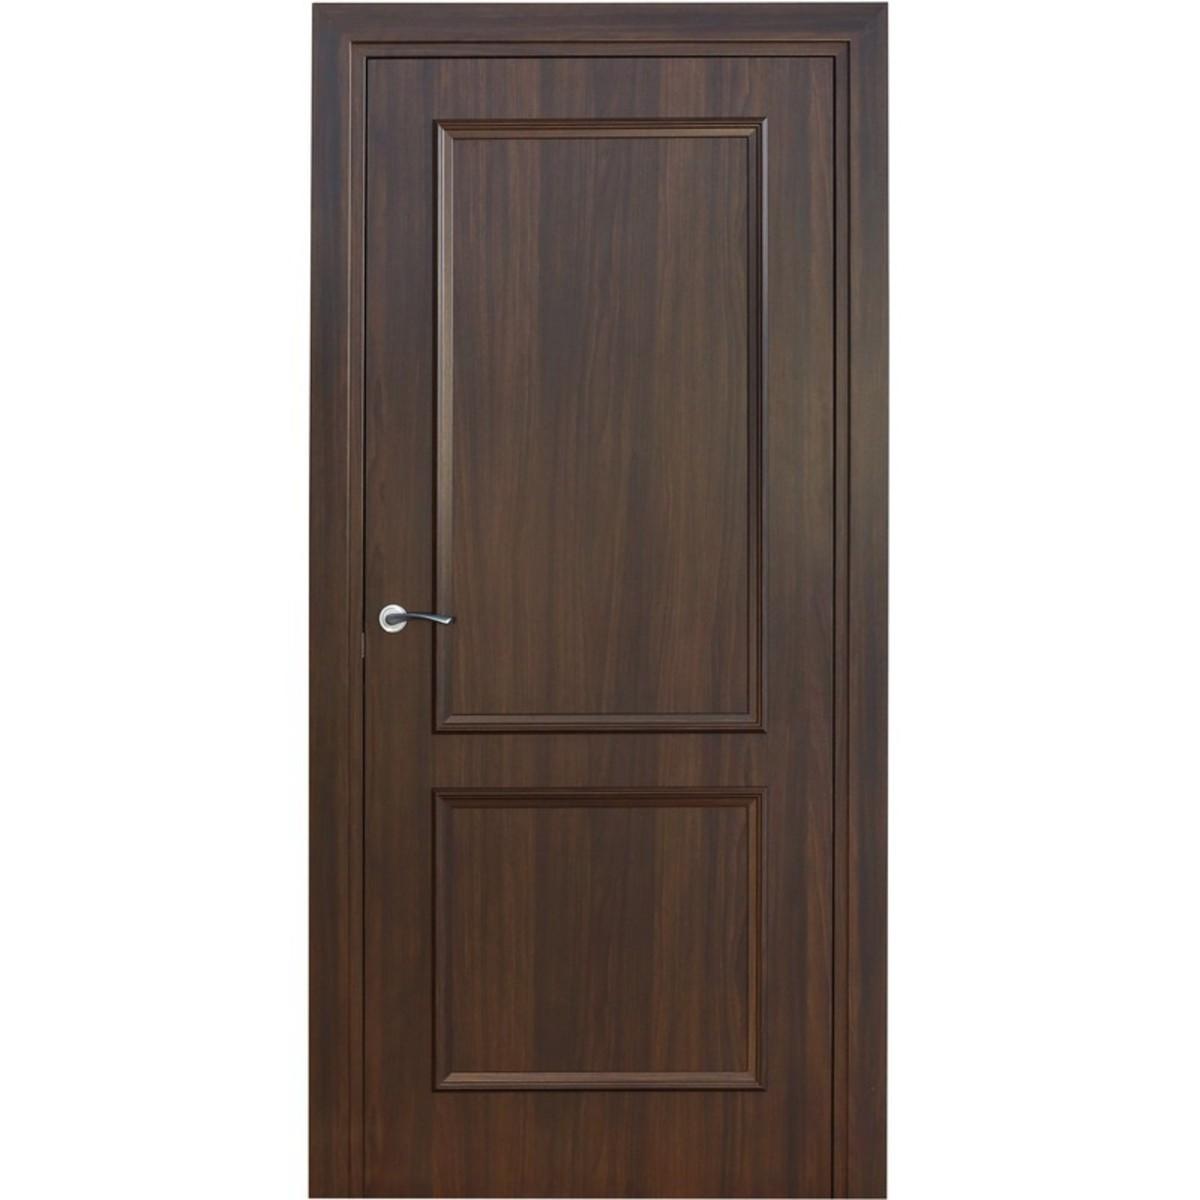 Дверь Межкомнатная Глухая Altro 60x200 Ламинация Цвет Орех Марроне